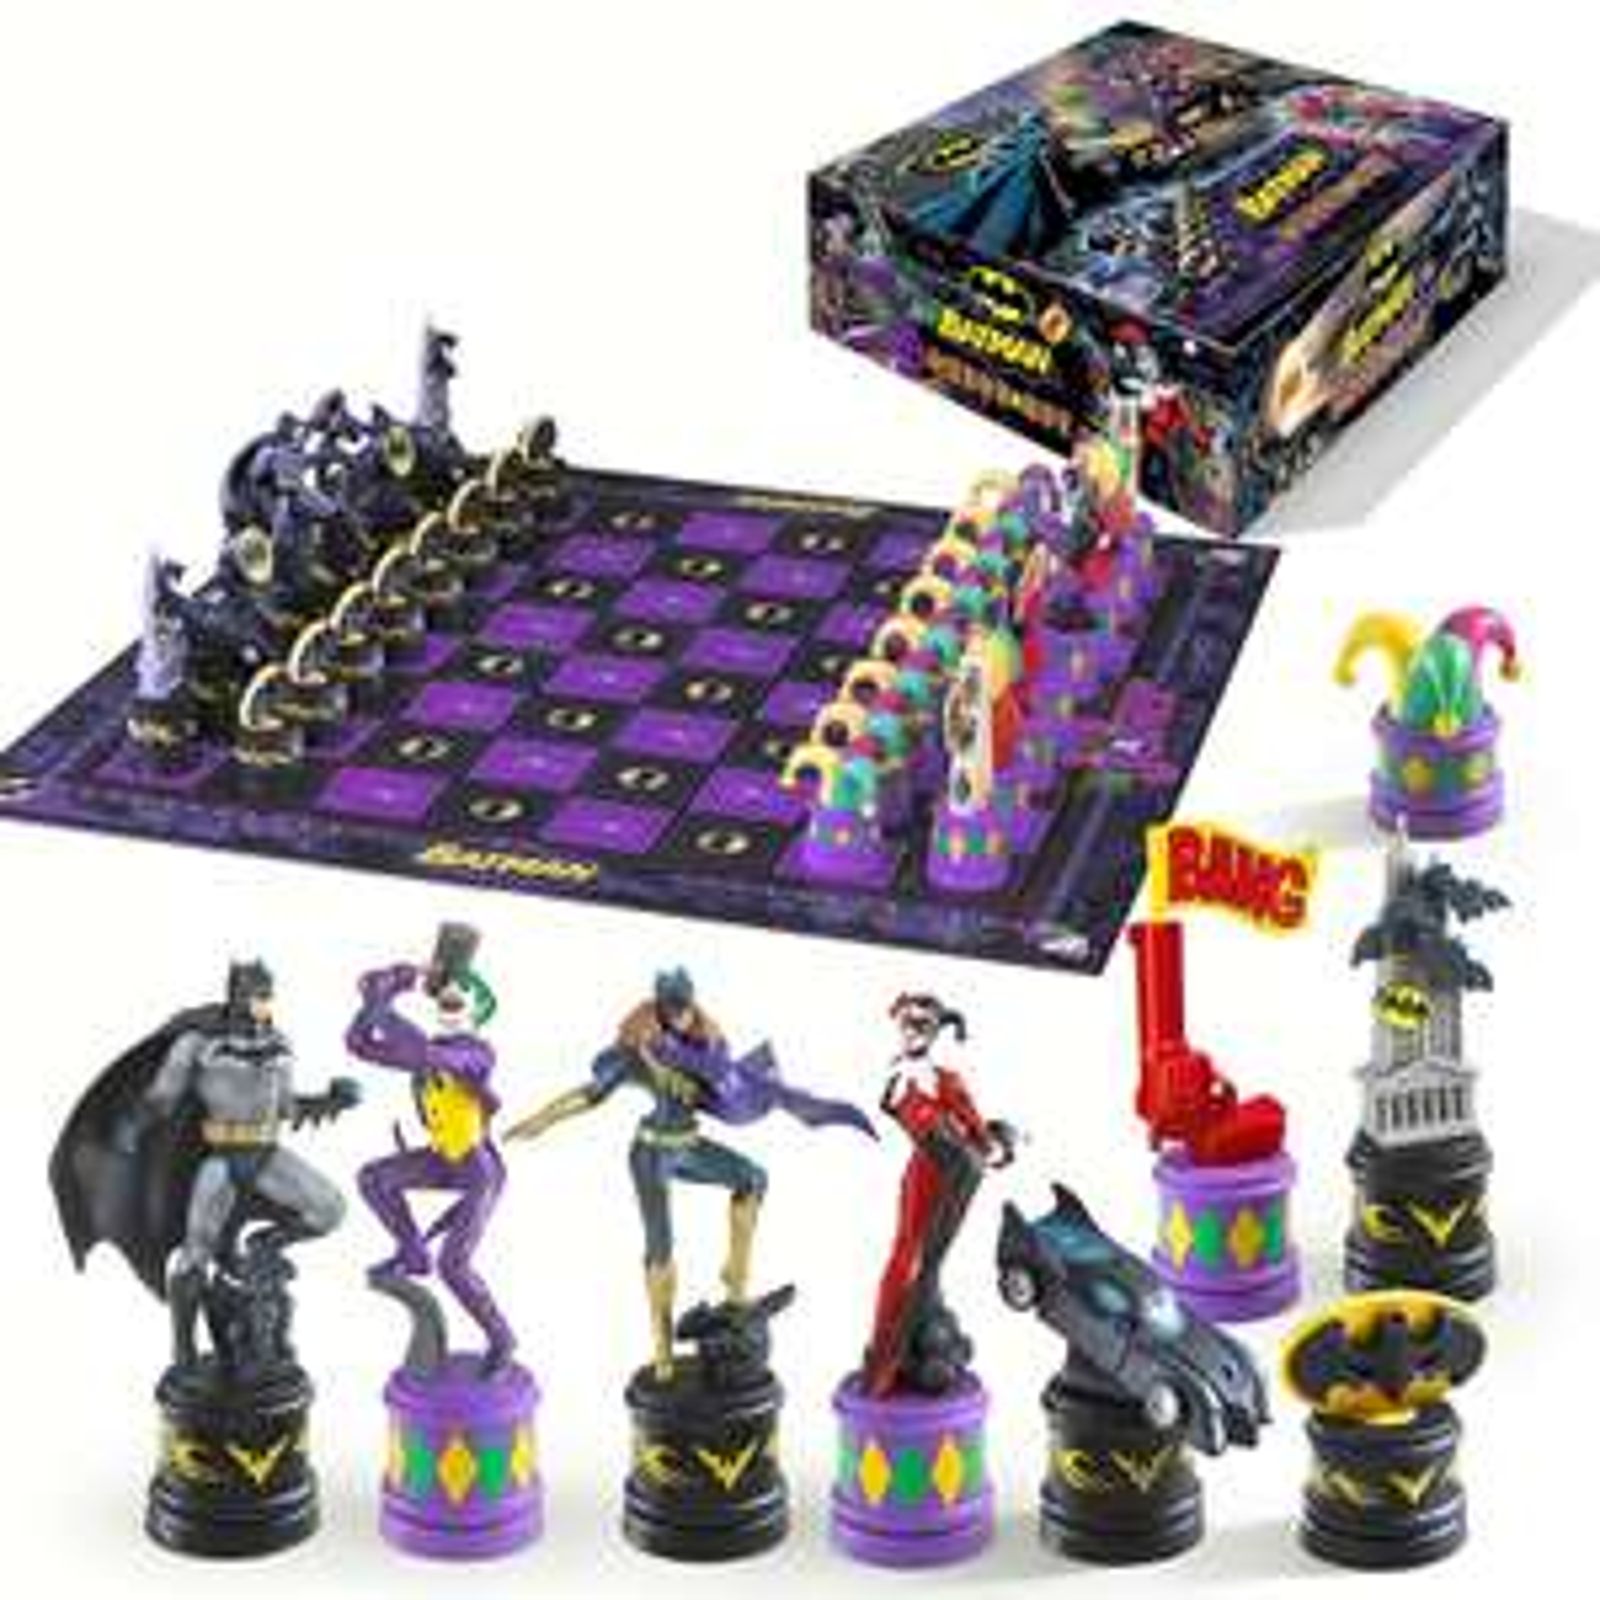 DC Comics The Dark Knight Batman Chess Set for £25.98 delivered using code @ Zavvi